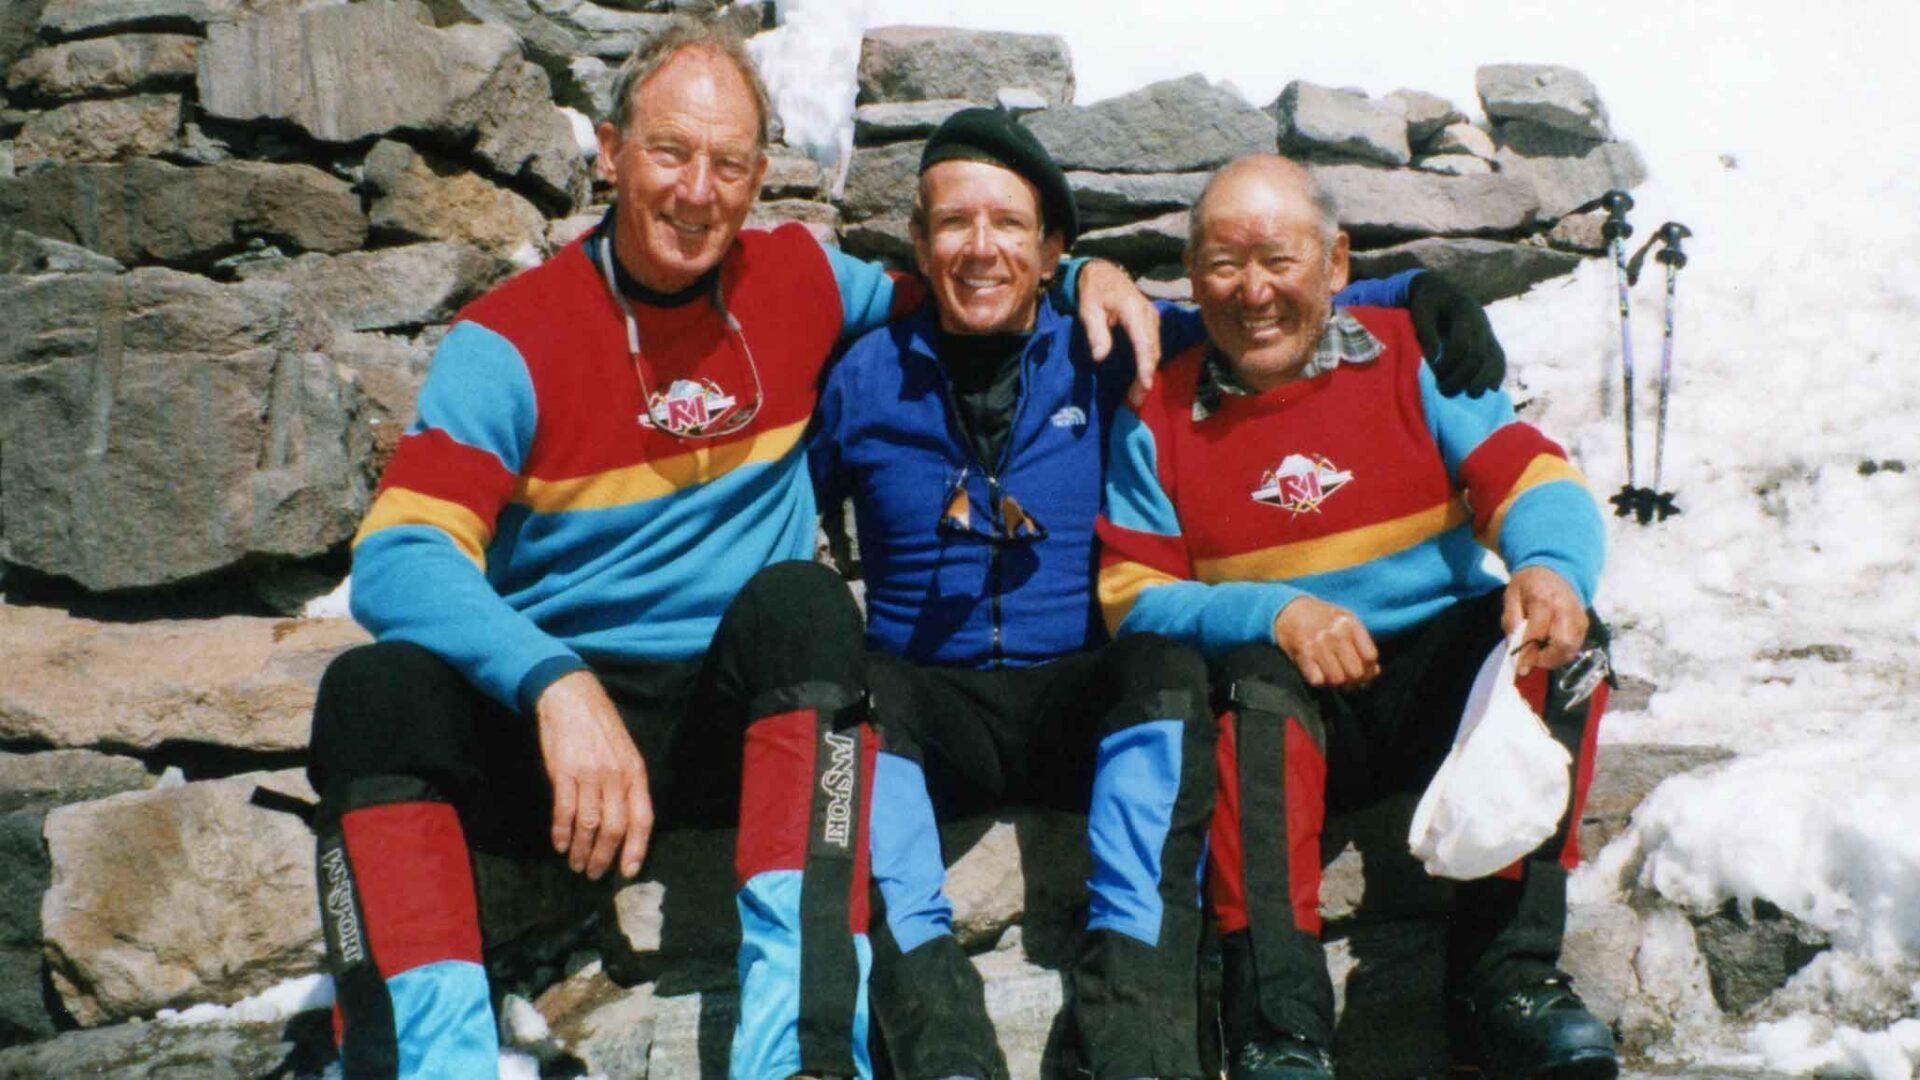 Michael Hodgson on Mount Rainier with Lou Whittaker and Nawang Gambu